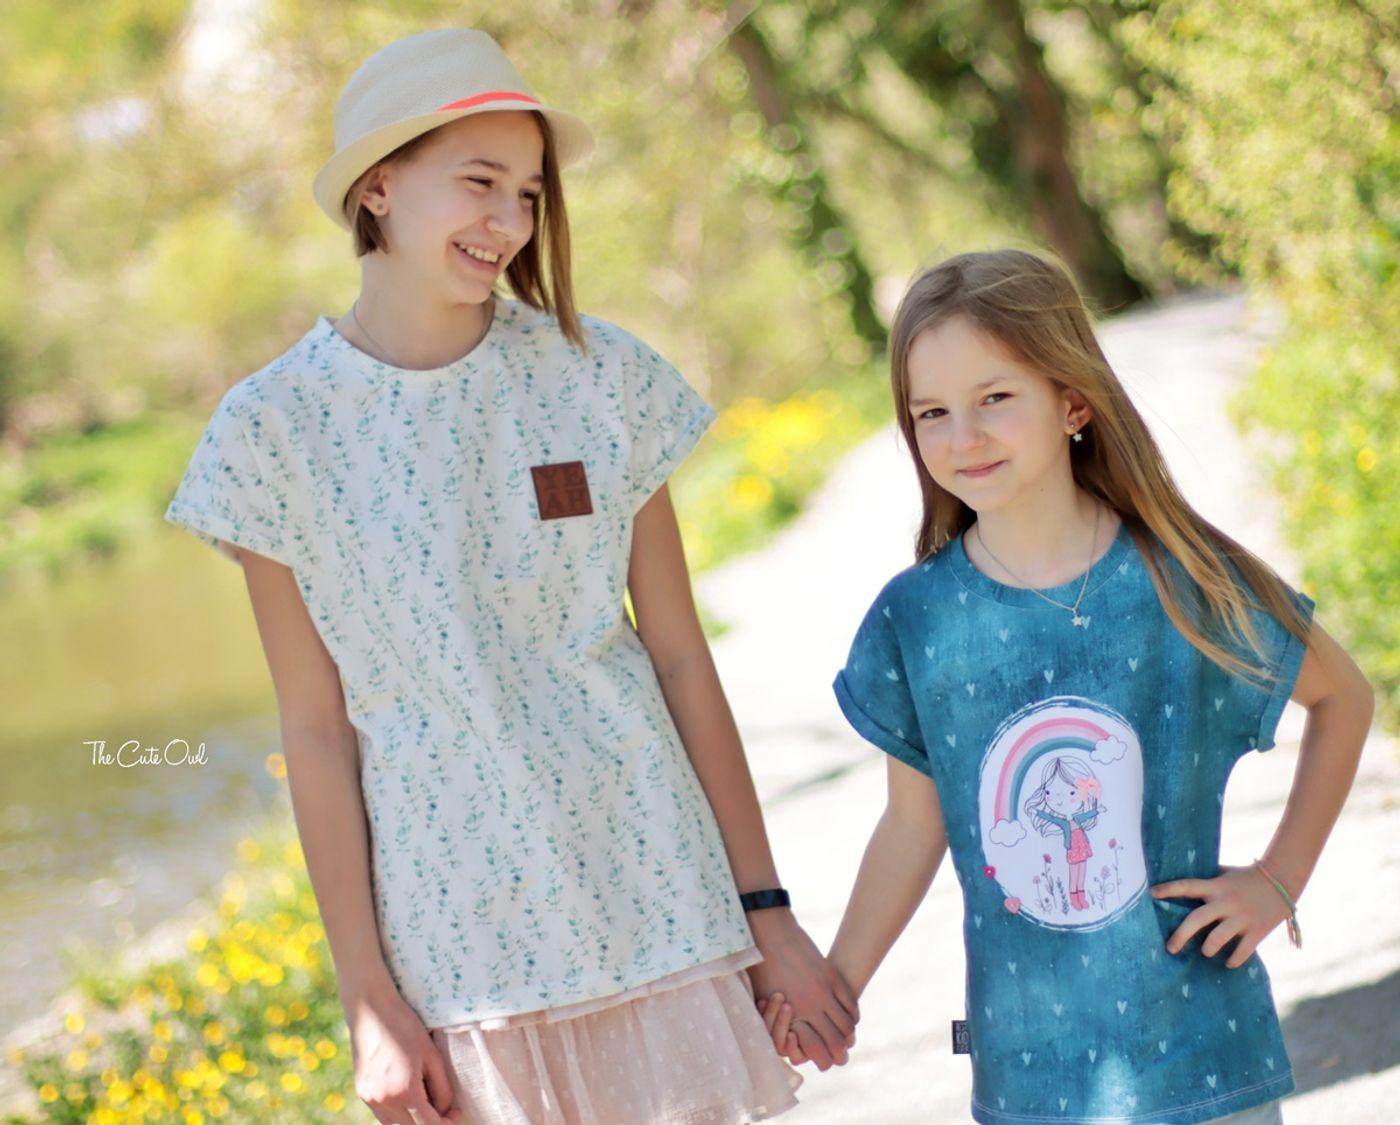 Produktfoto 28 von MiToSa-Kreativ für Schnittmuster Kombi E-Book Family Shirt Kinder, Damen & Männer Gr. 74 - 164, 34 - 52 & XS - 3XL